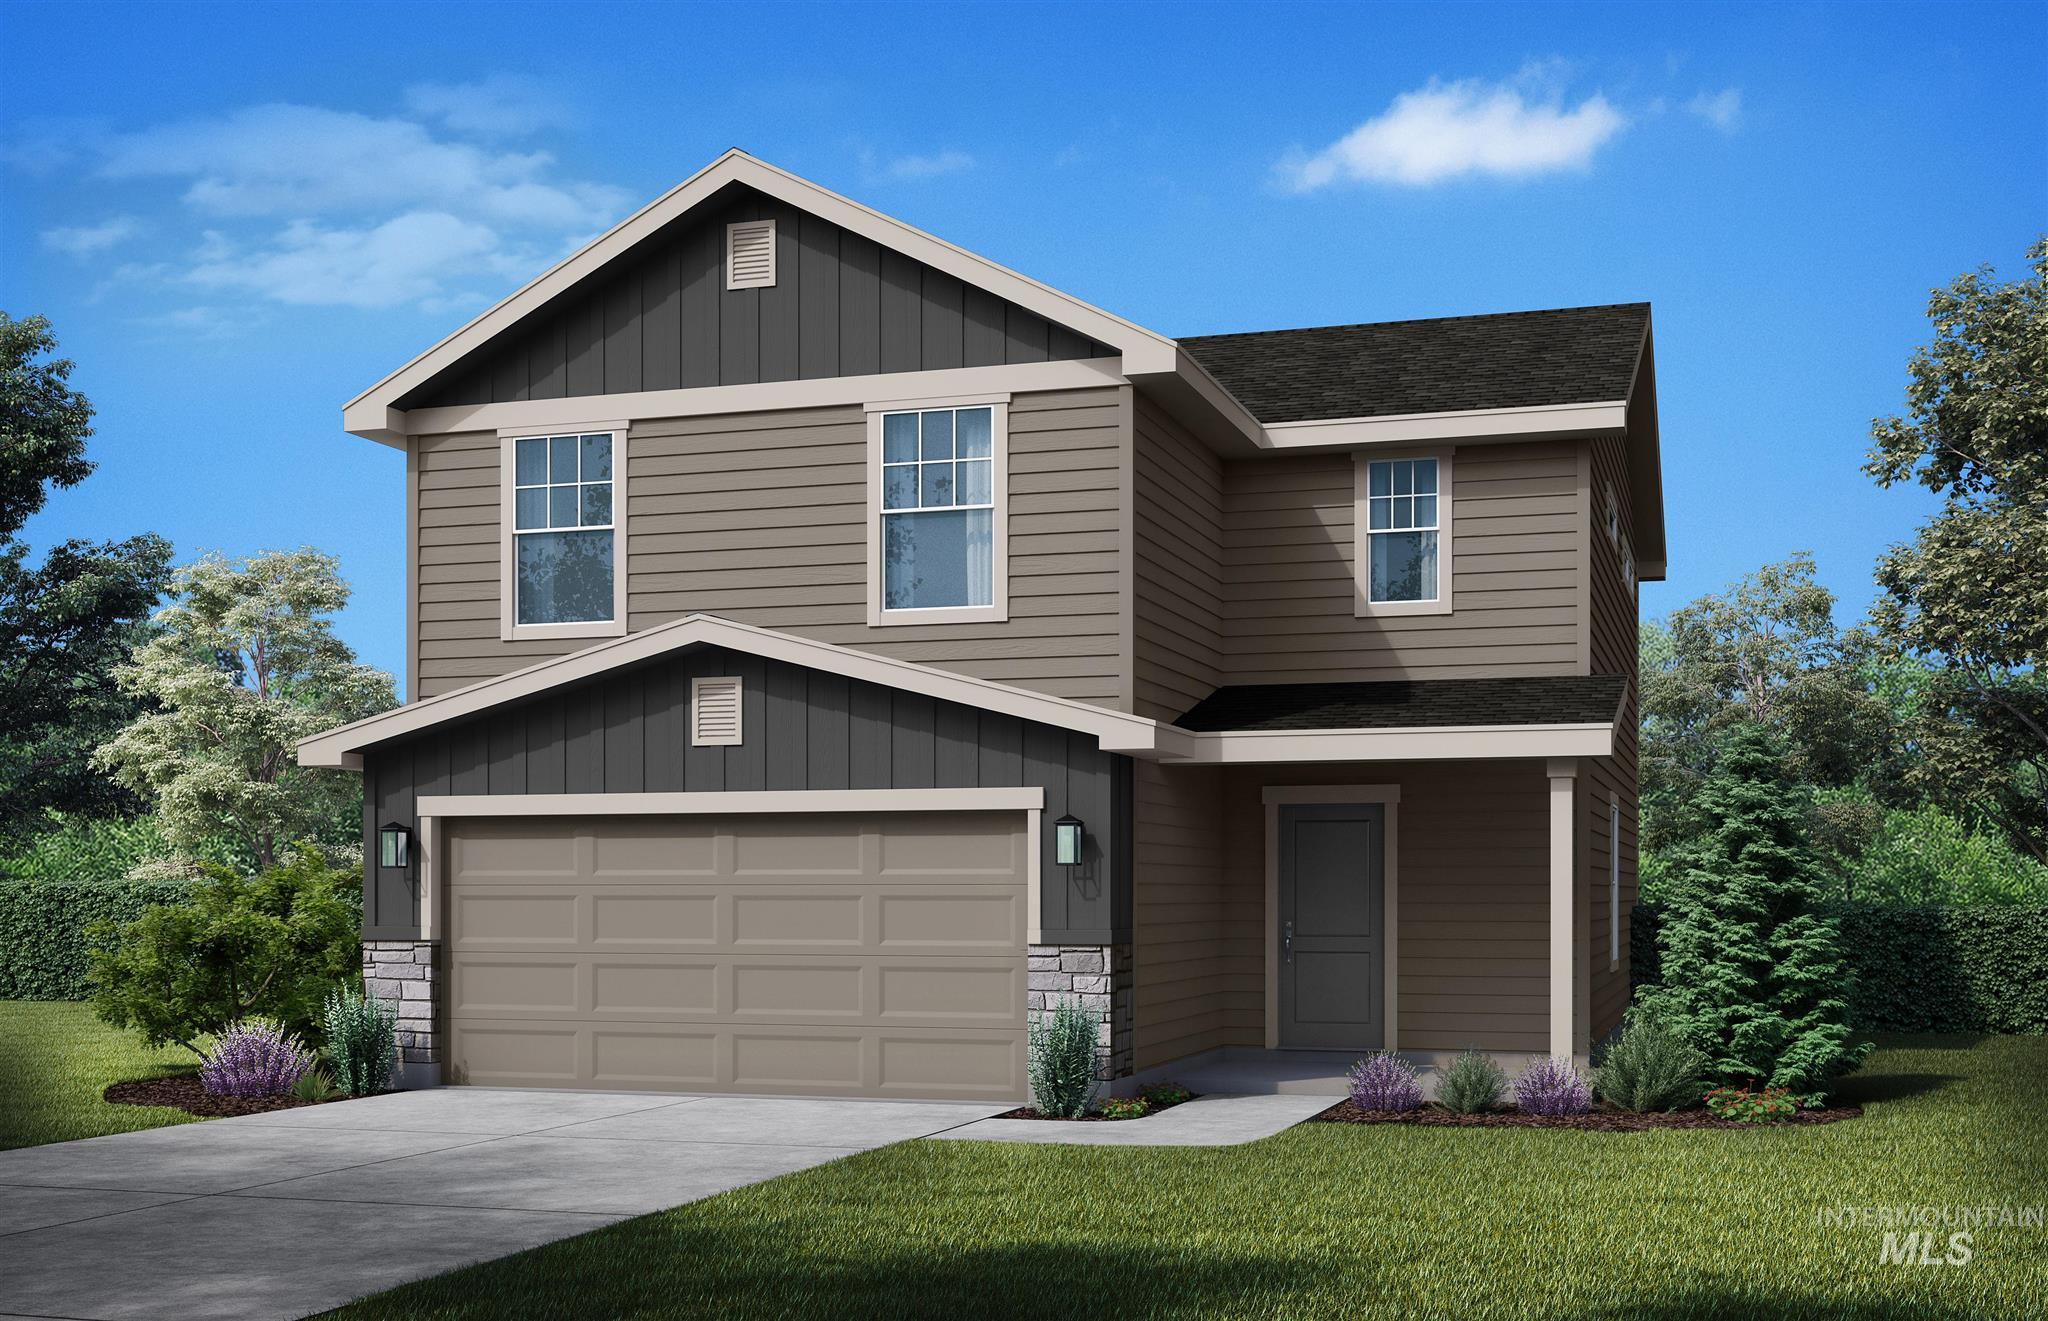 5978 S Carlburg Ave. Property Photo - Boise, ID real estate listing